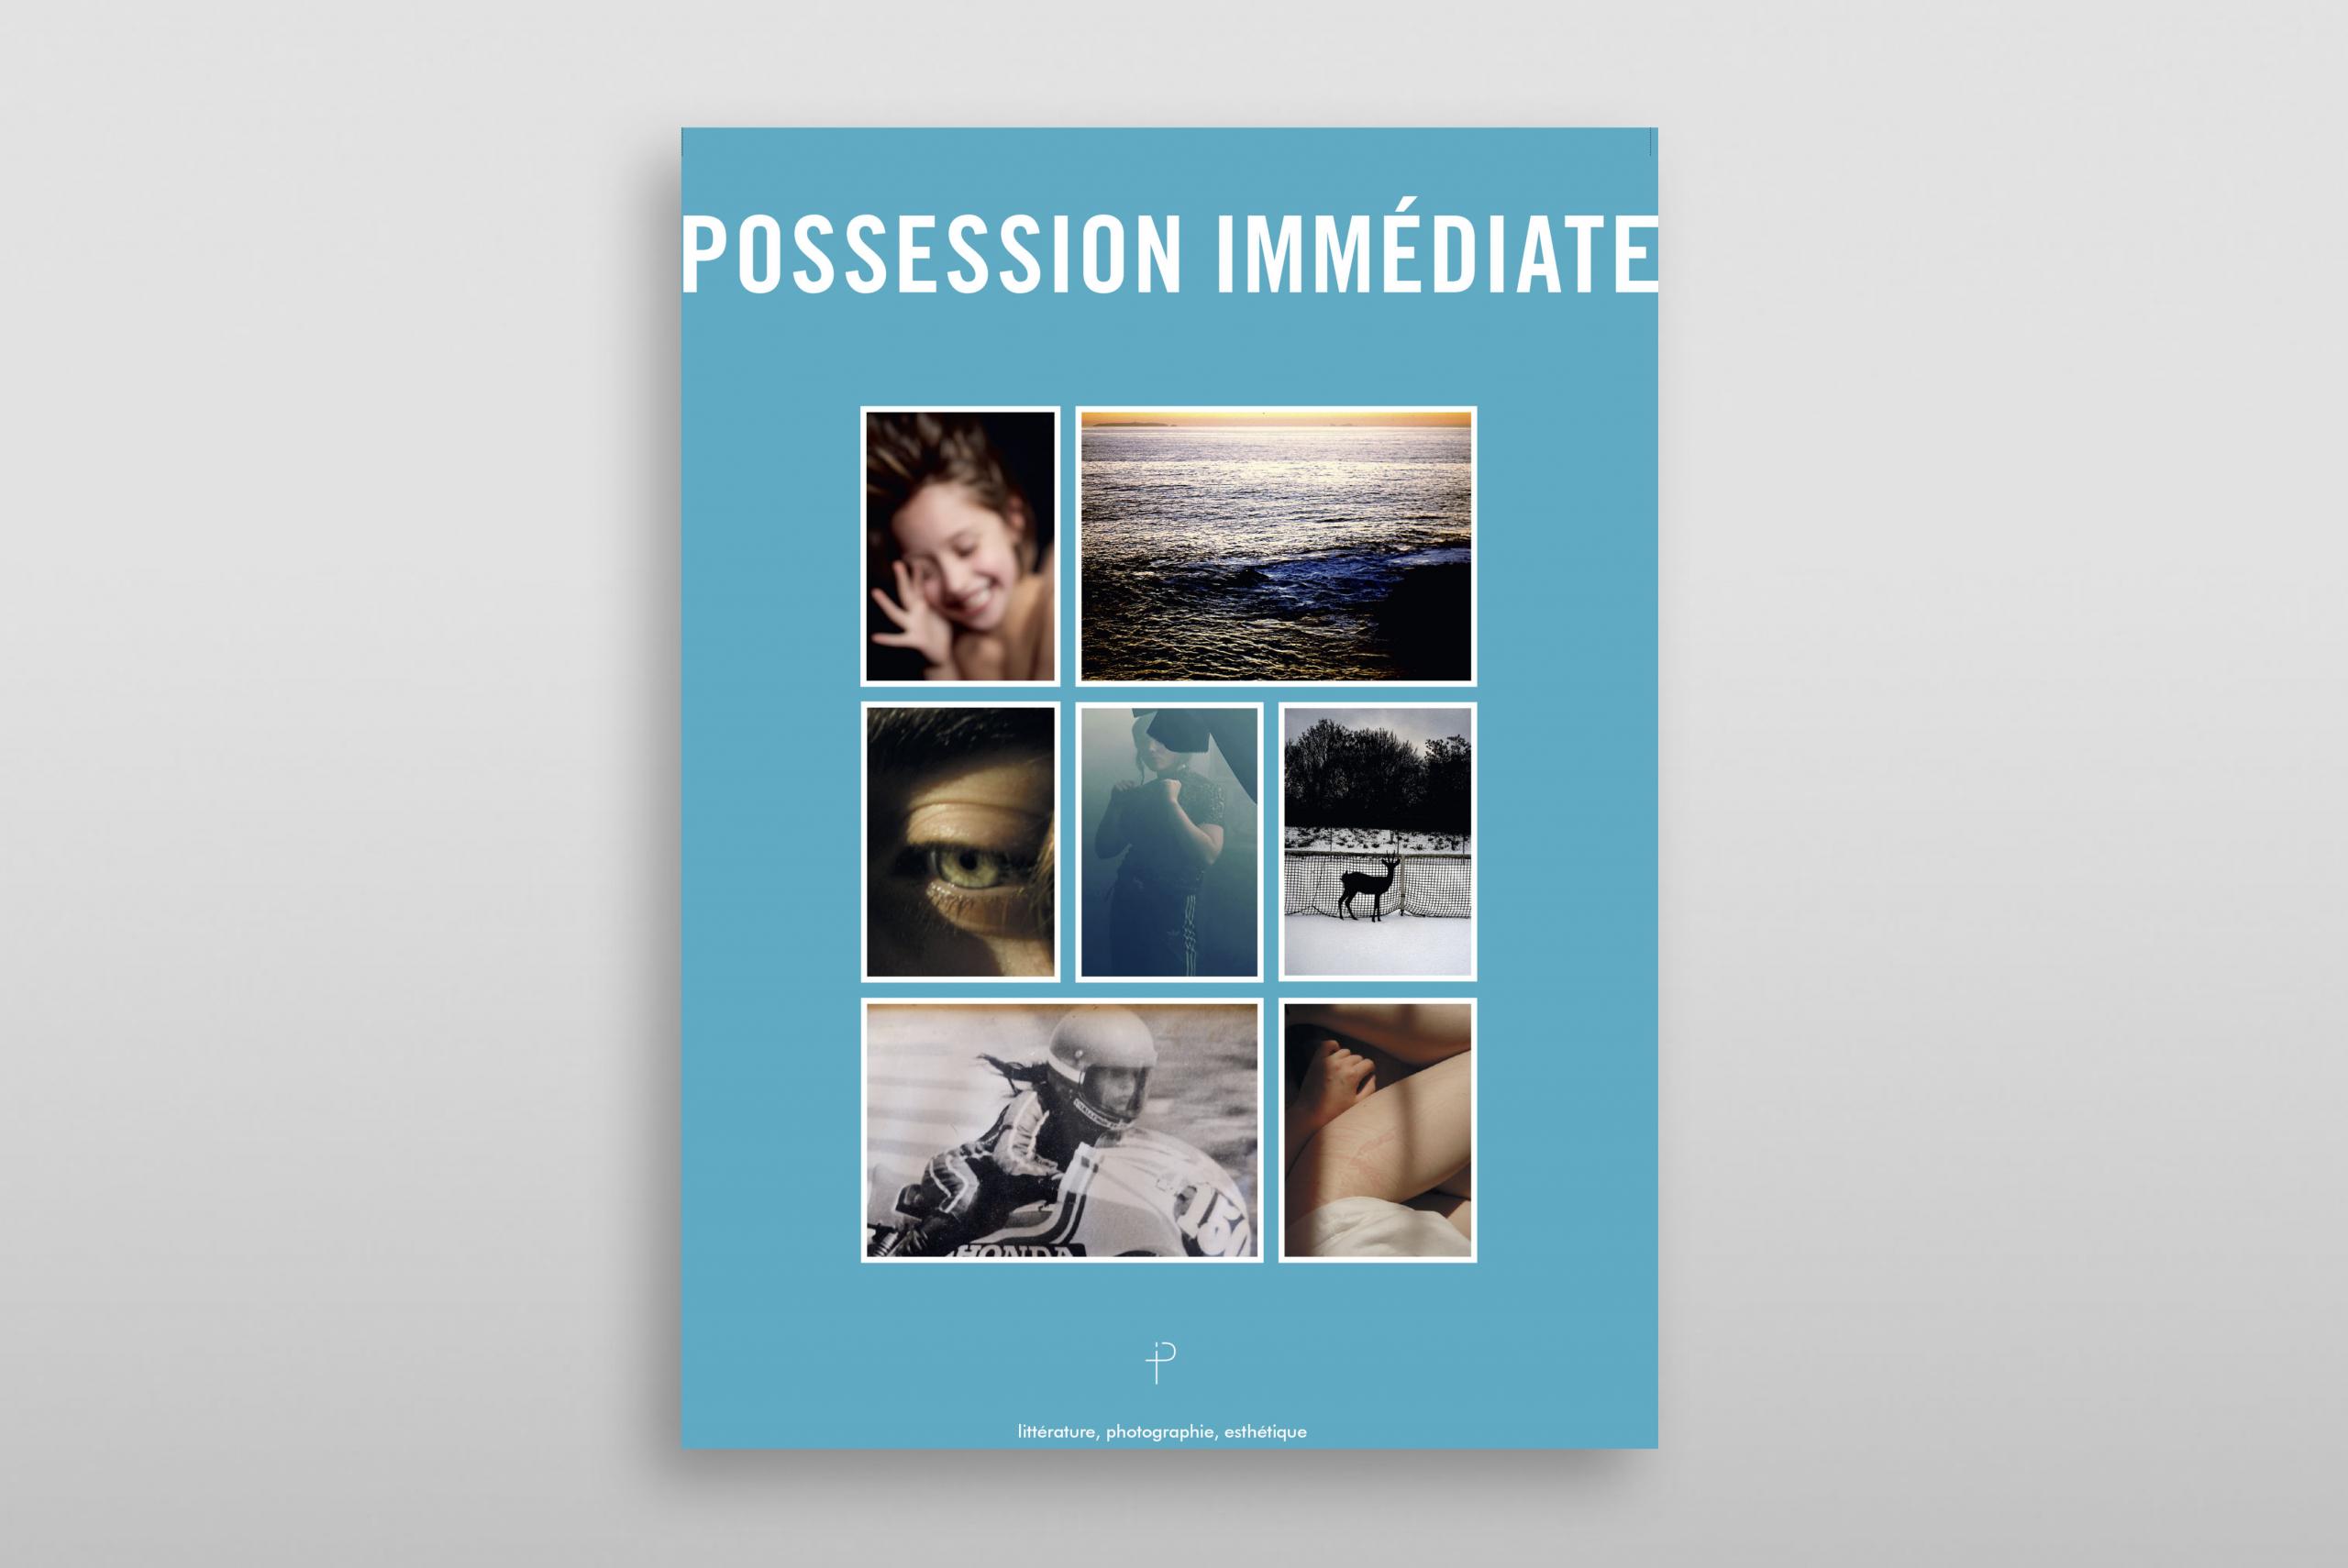 Possession Immediate / Vol. X